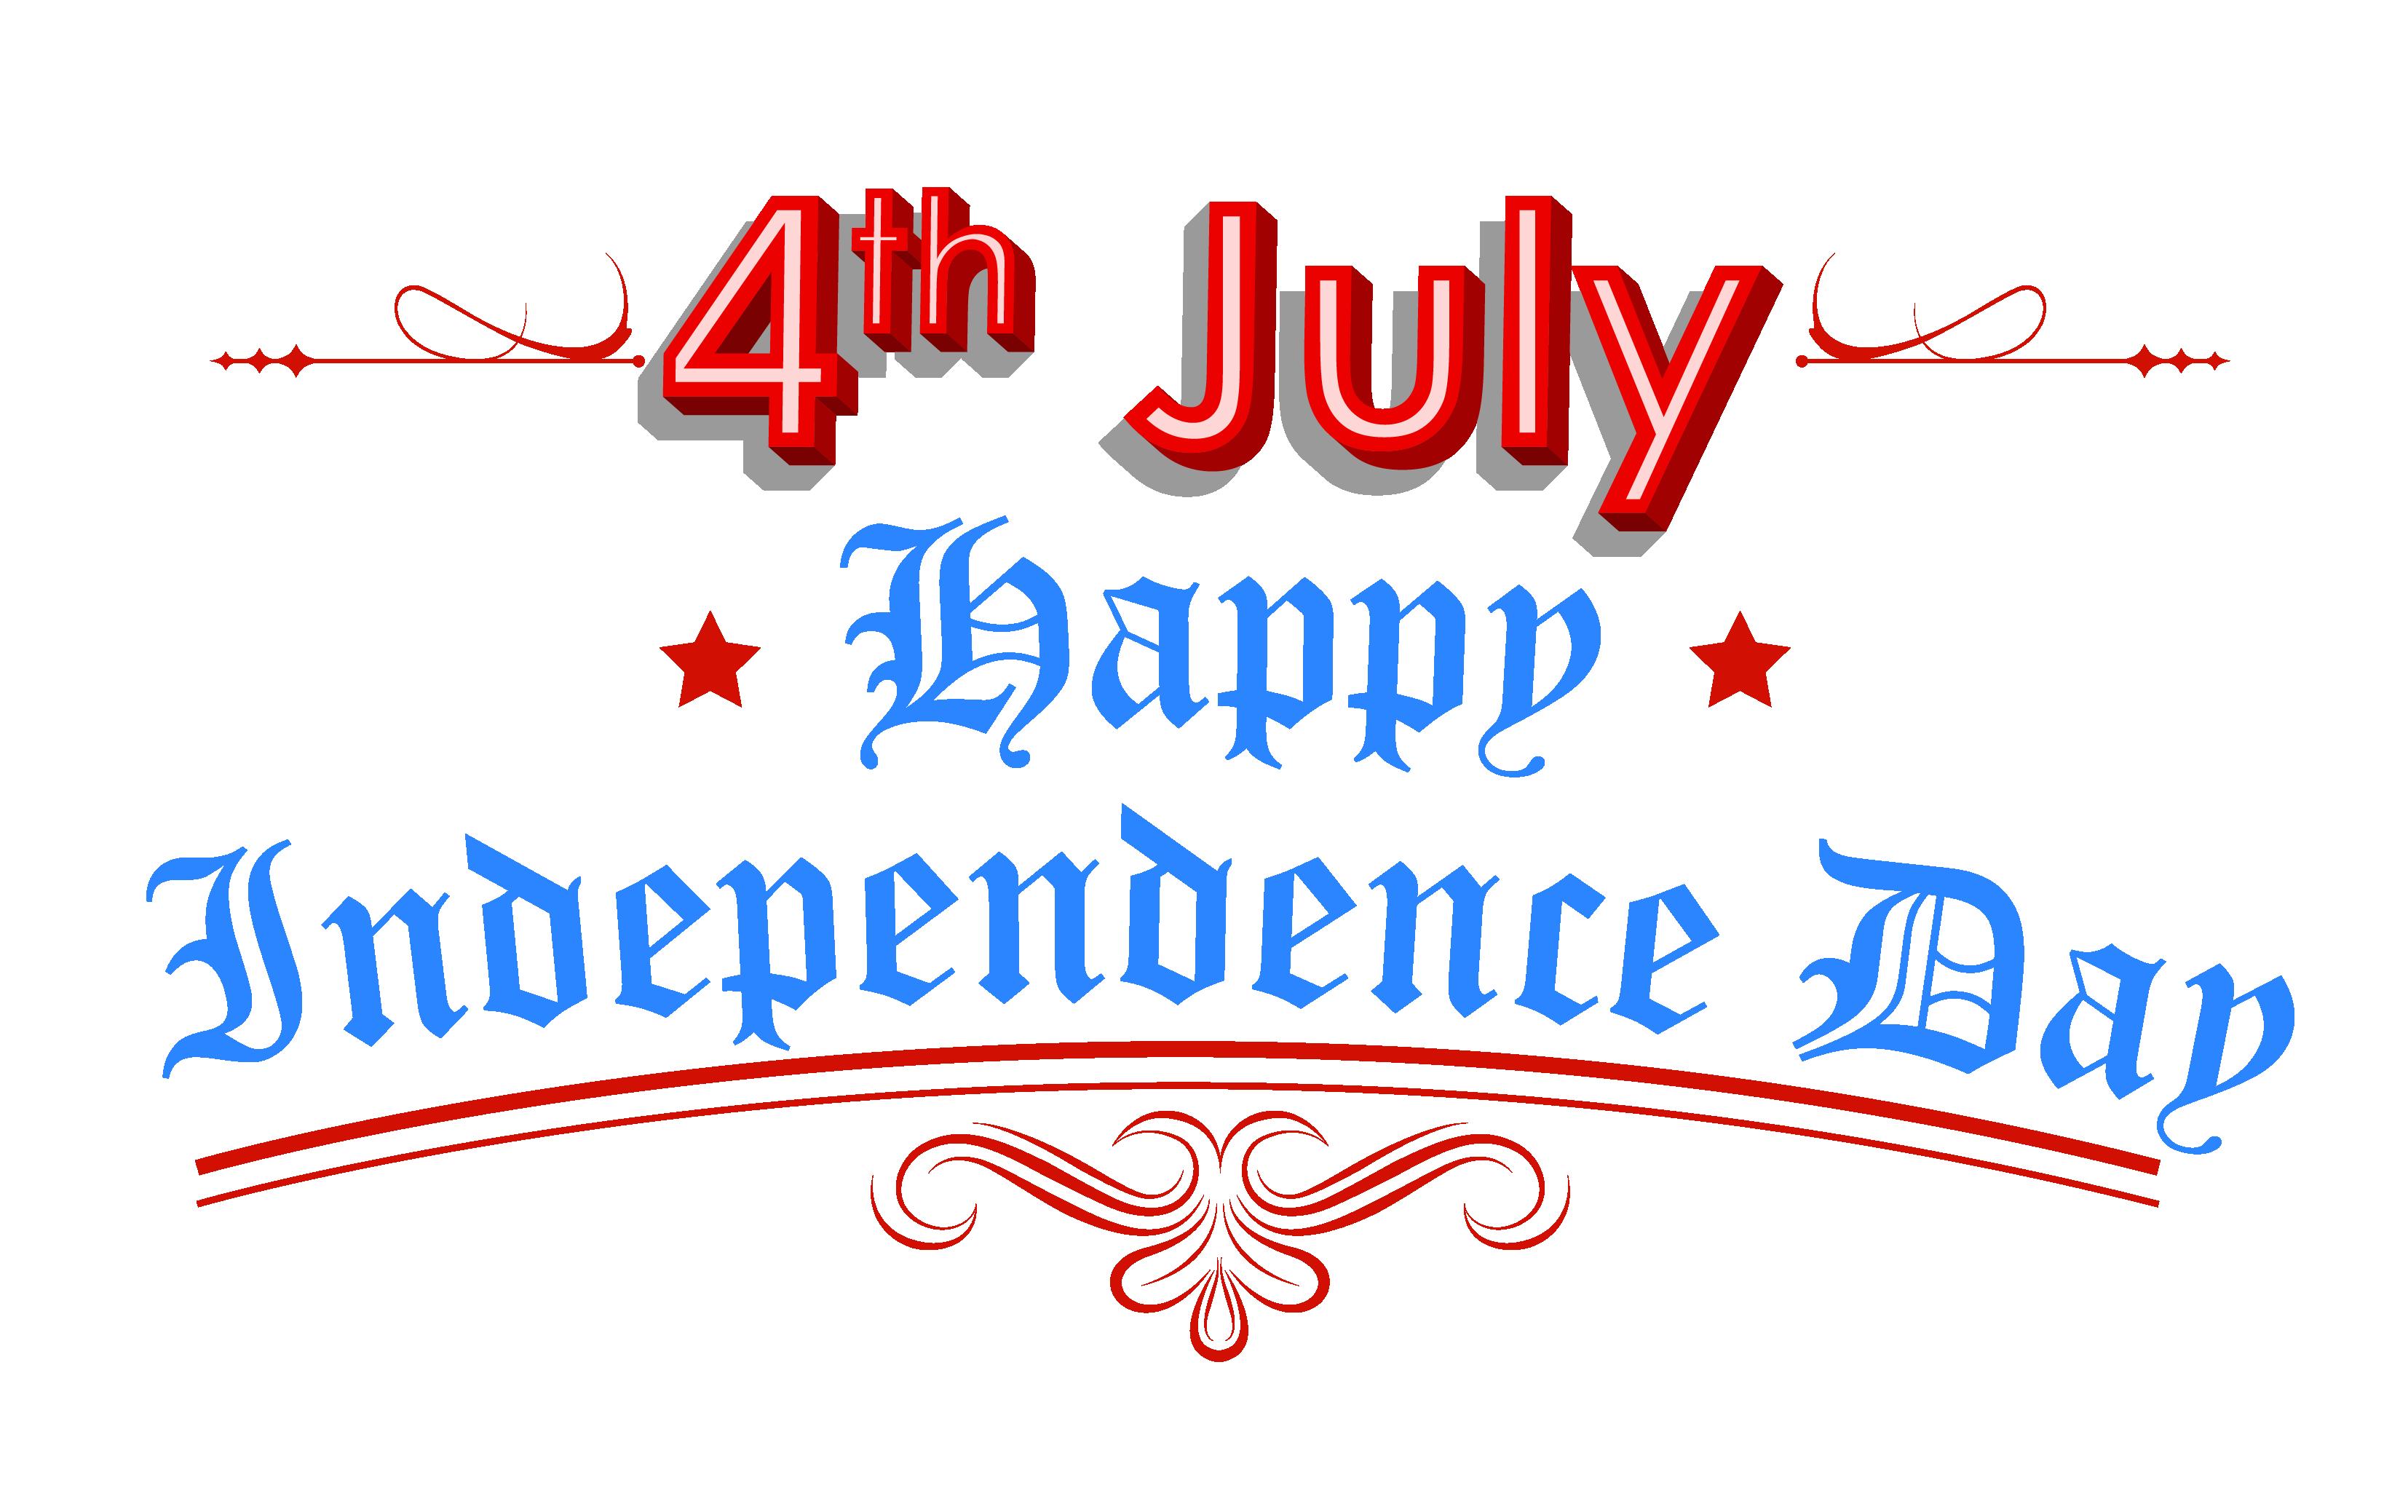 July calendar clipart jpg free stock Happy Independence Day 4th July Clipart | July 4th Clip Art ... jpg free stock